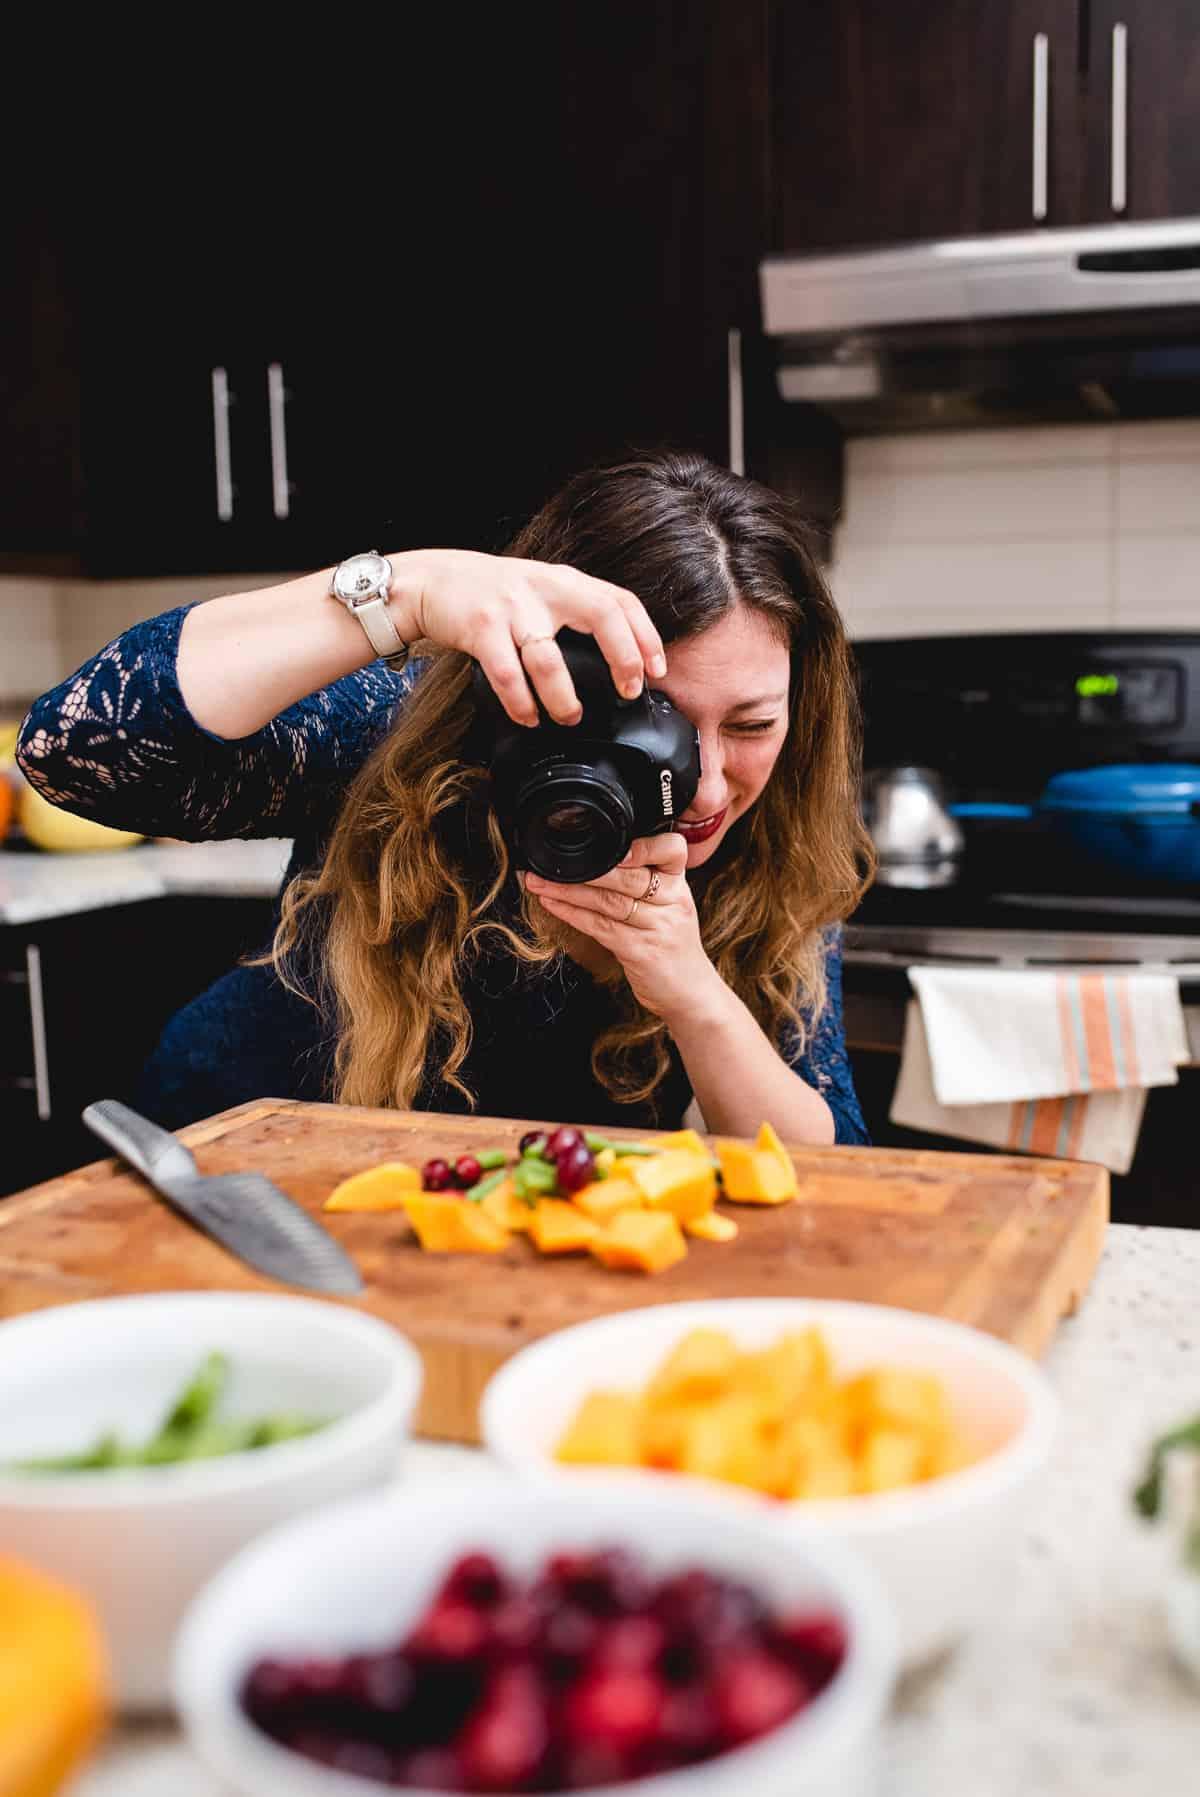 shooting food on cutting board